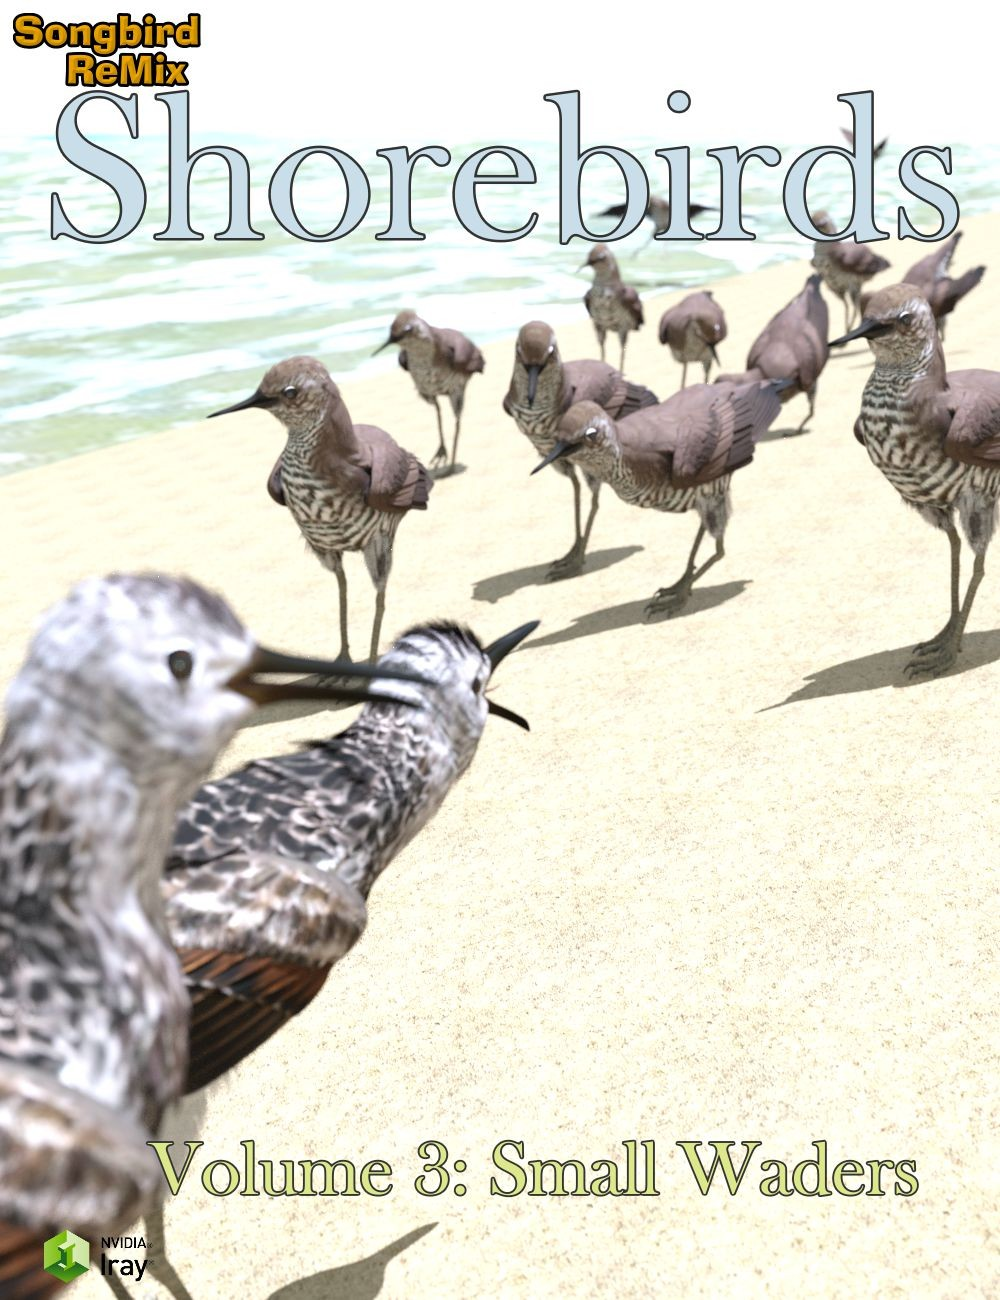 10086-sbrm-shorebirds-vol-3-small-waders-main.jpg